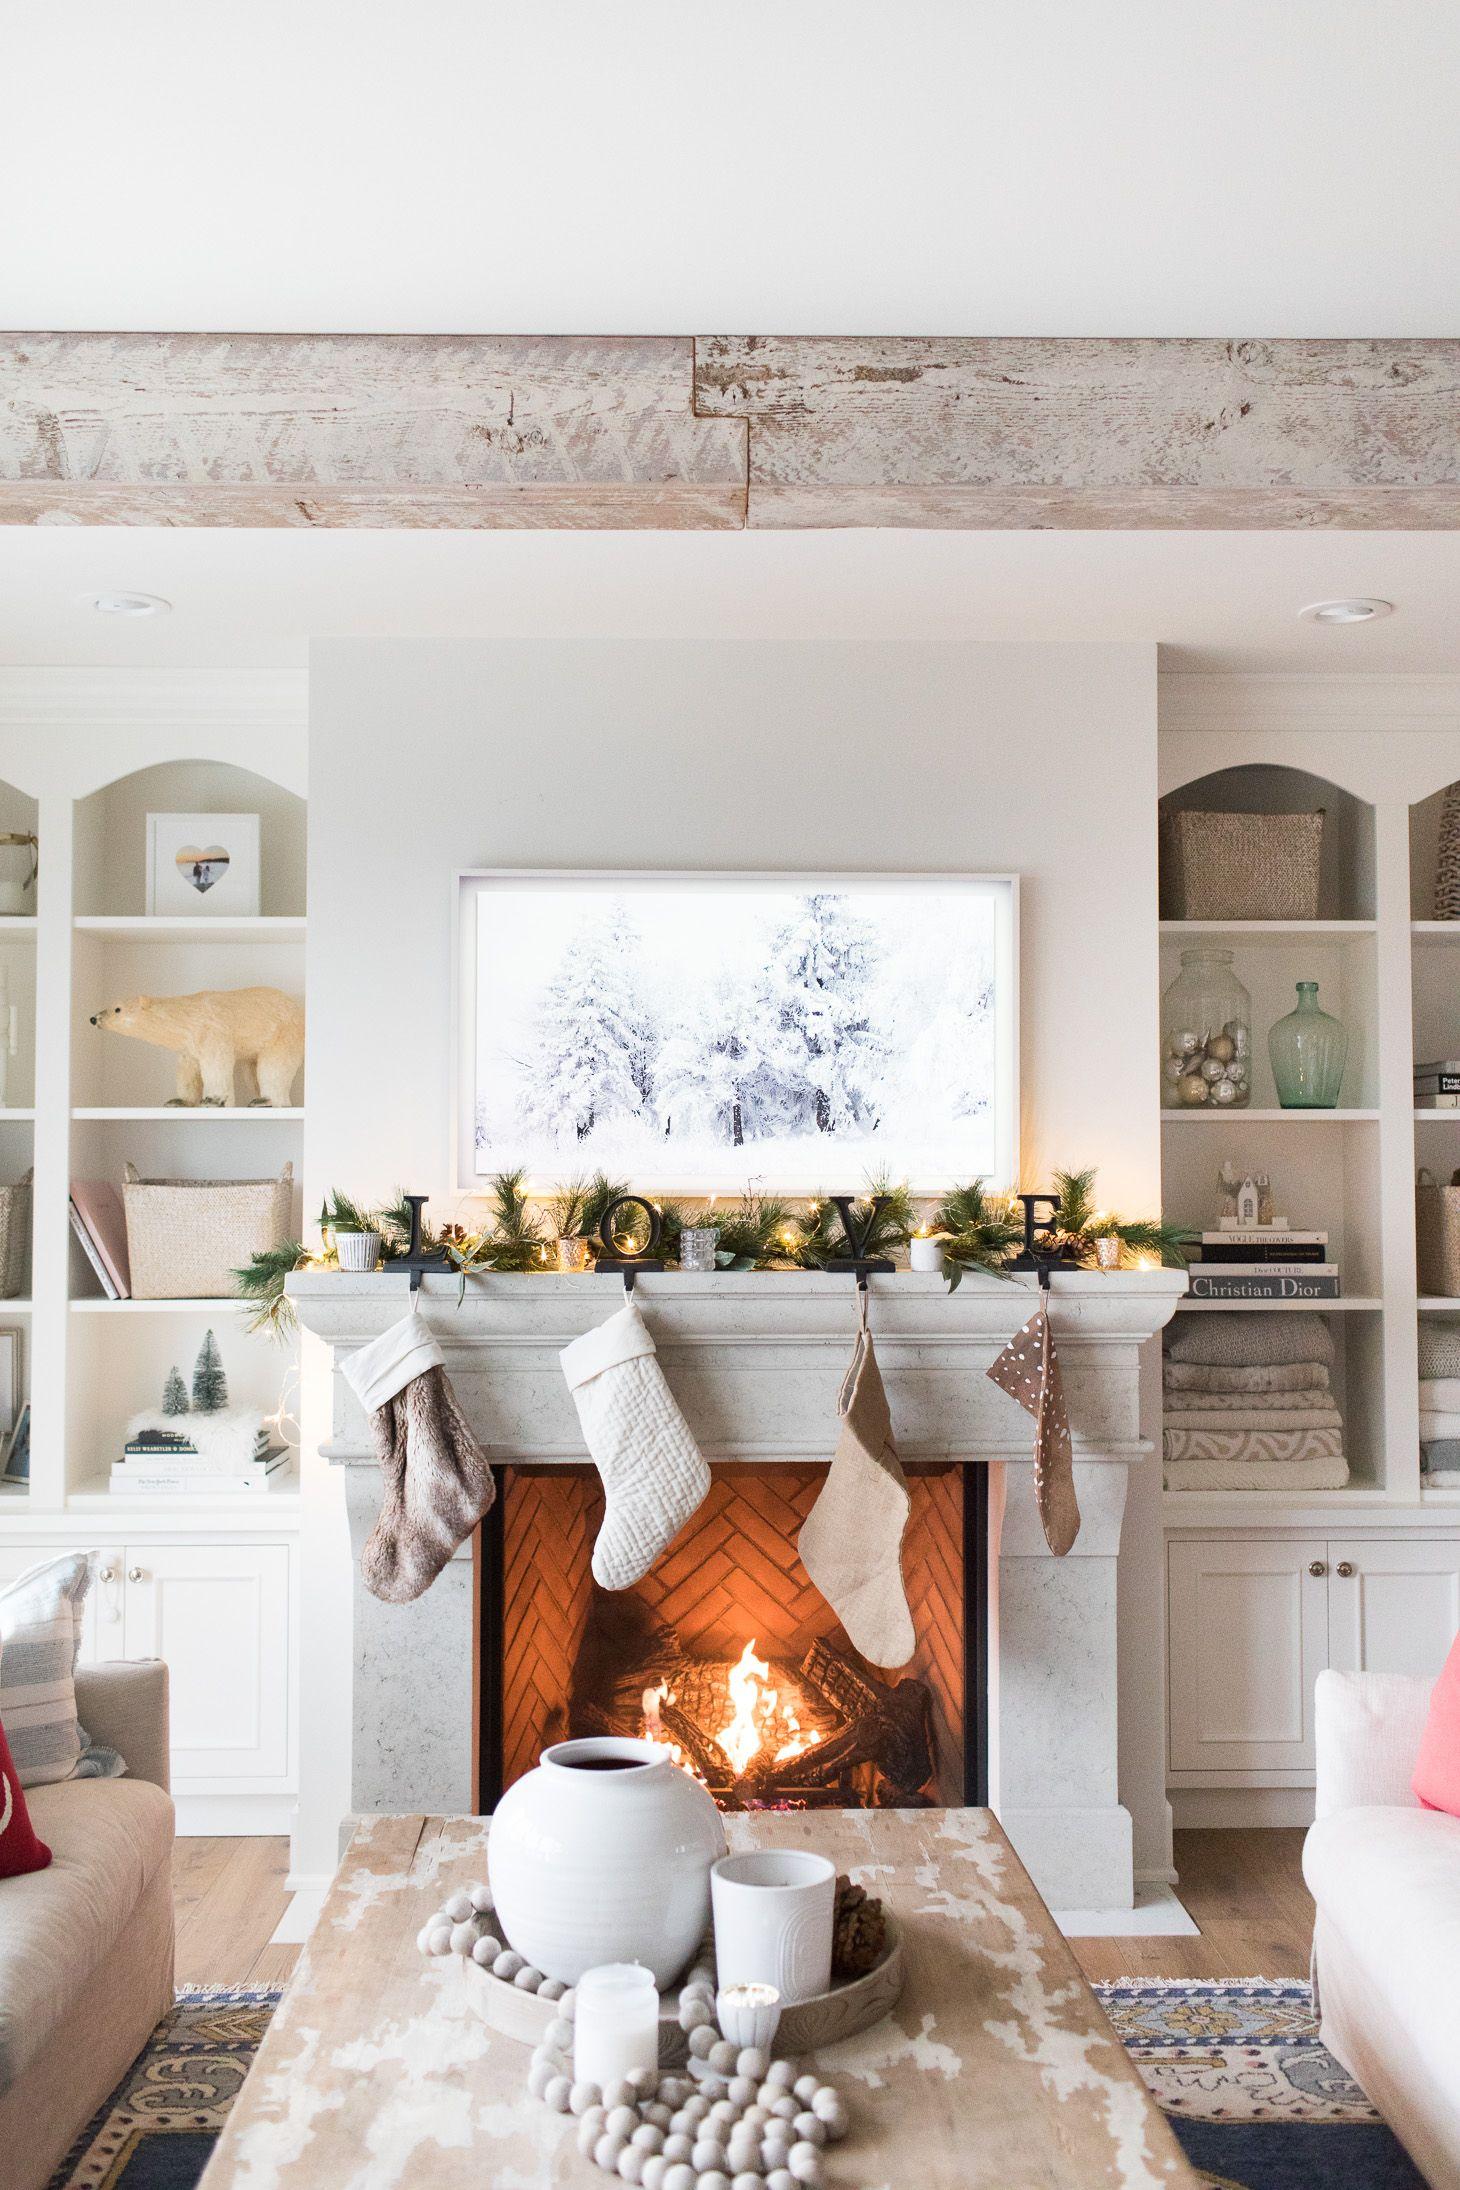 Jillian Harris 12 Days of Christmas Giveaways Best Buy Canada ...